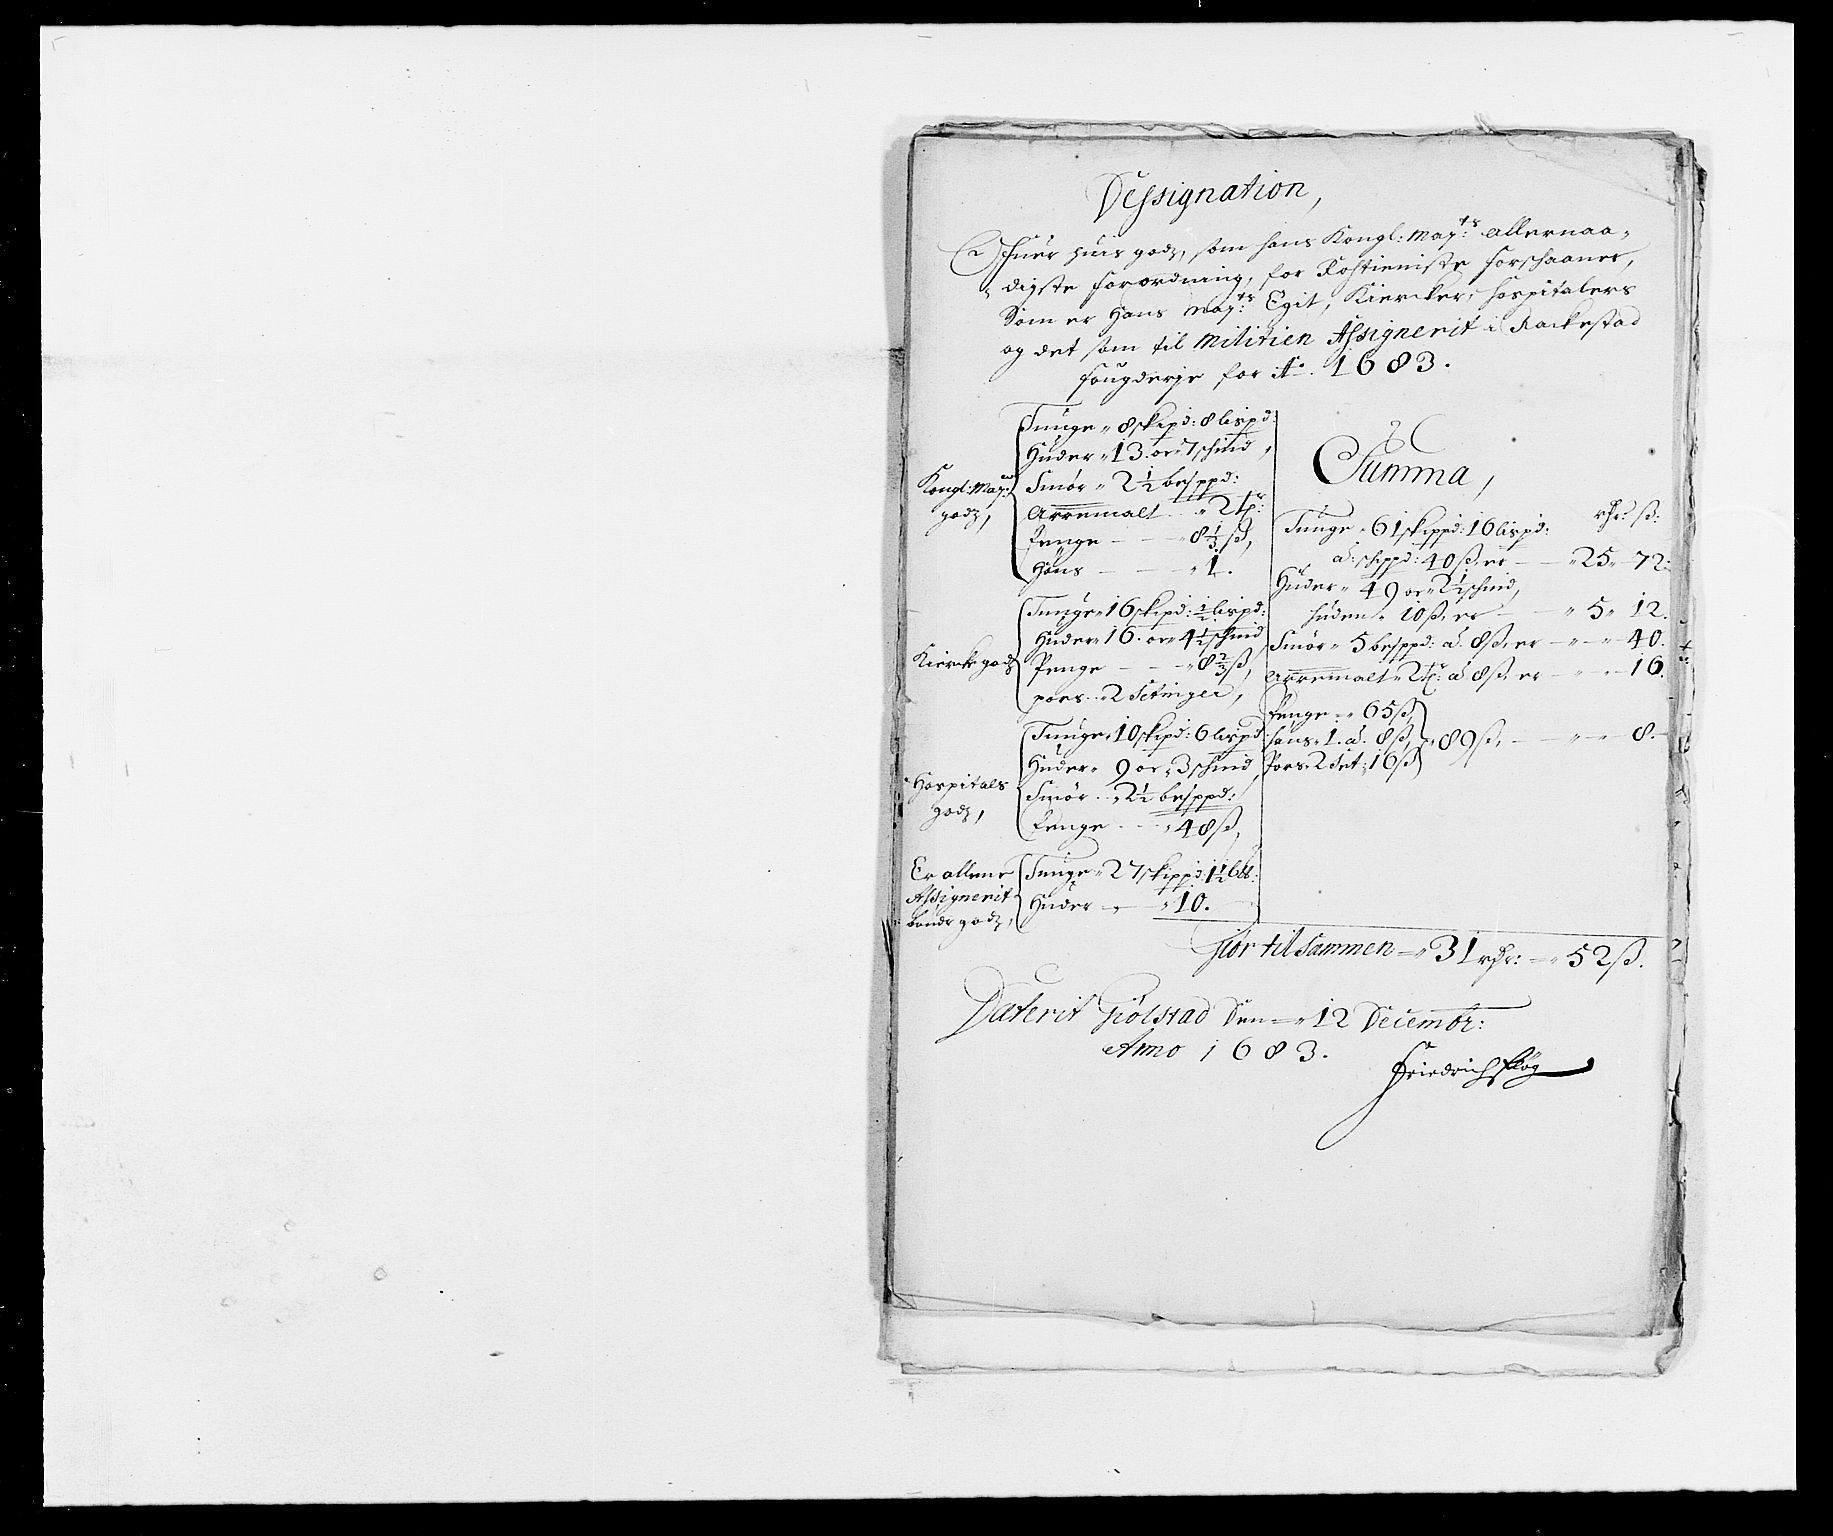 RA, Rentekammeret inntil 1814, Reviderte regnskaper, Fogderegnskap, R05/L0274: Fogderegnskap Rakkestad, 1683-1684, s. 210